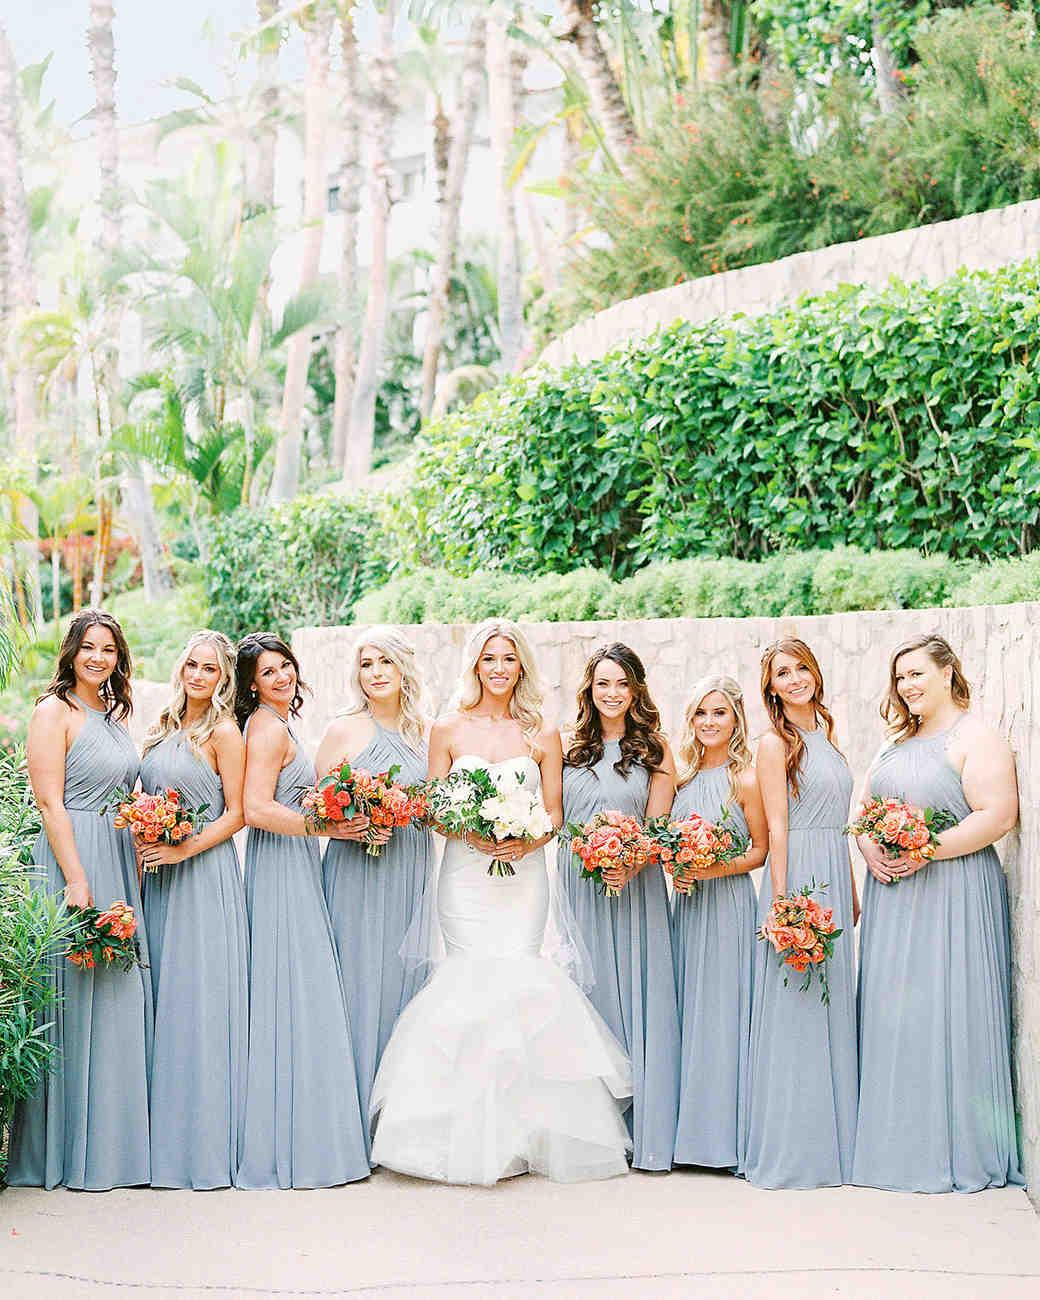 Grey Bridesmaids Dresses Orange Bridal Boutquest Mexico Wedding Designers Elena Damy Justin Turner Wedding